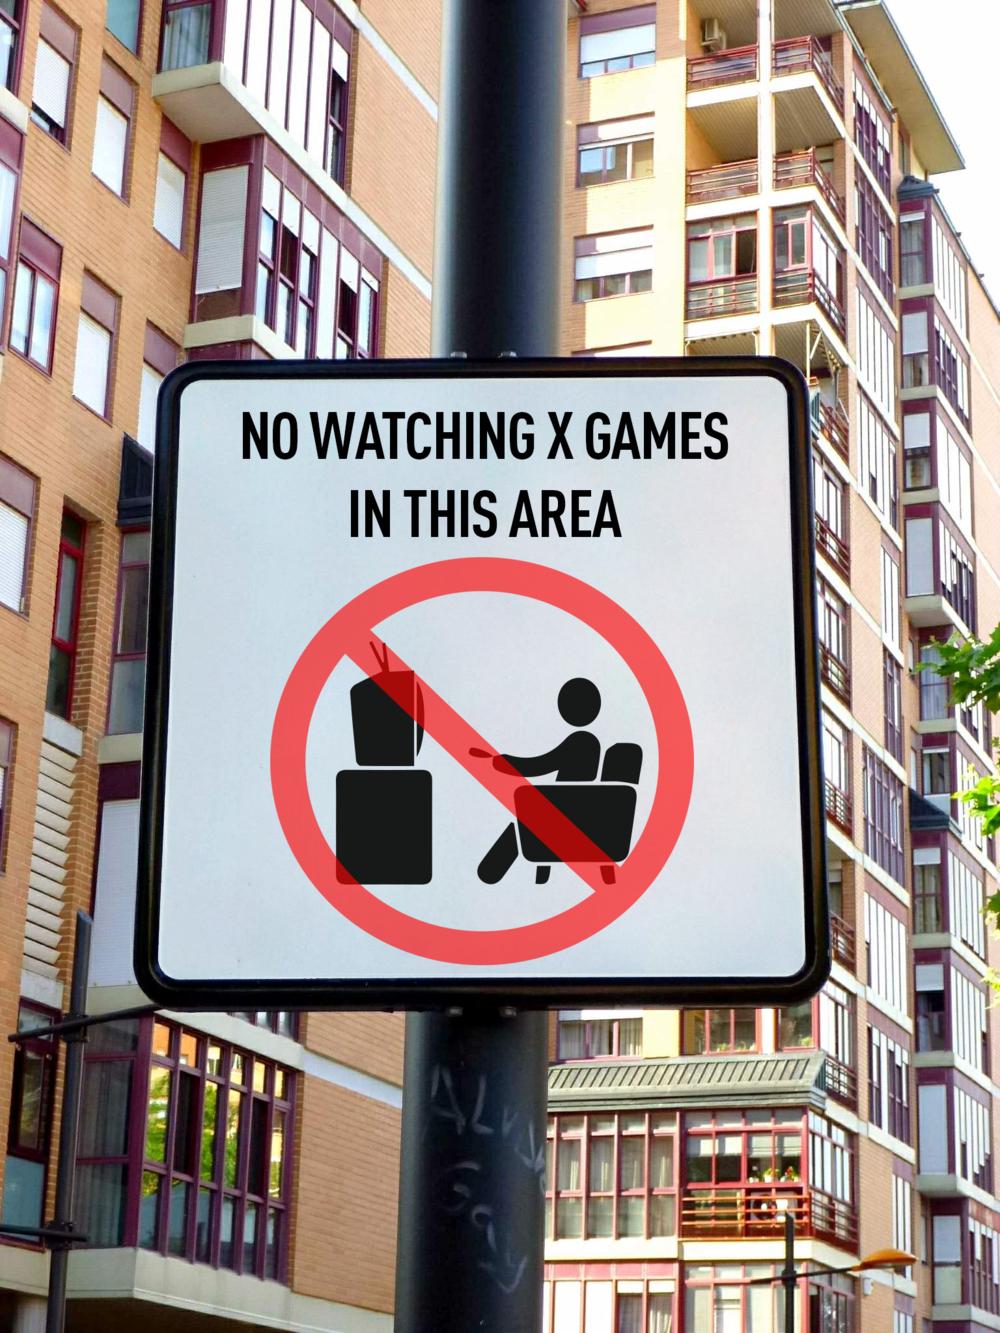 no x games sign1.png